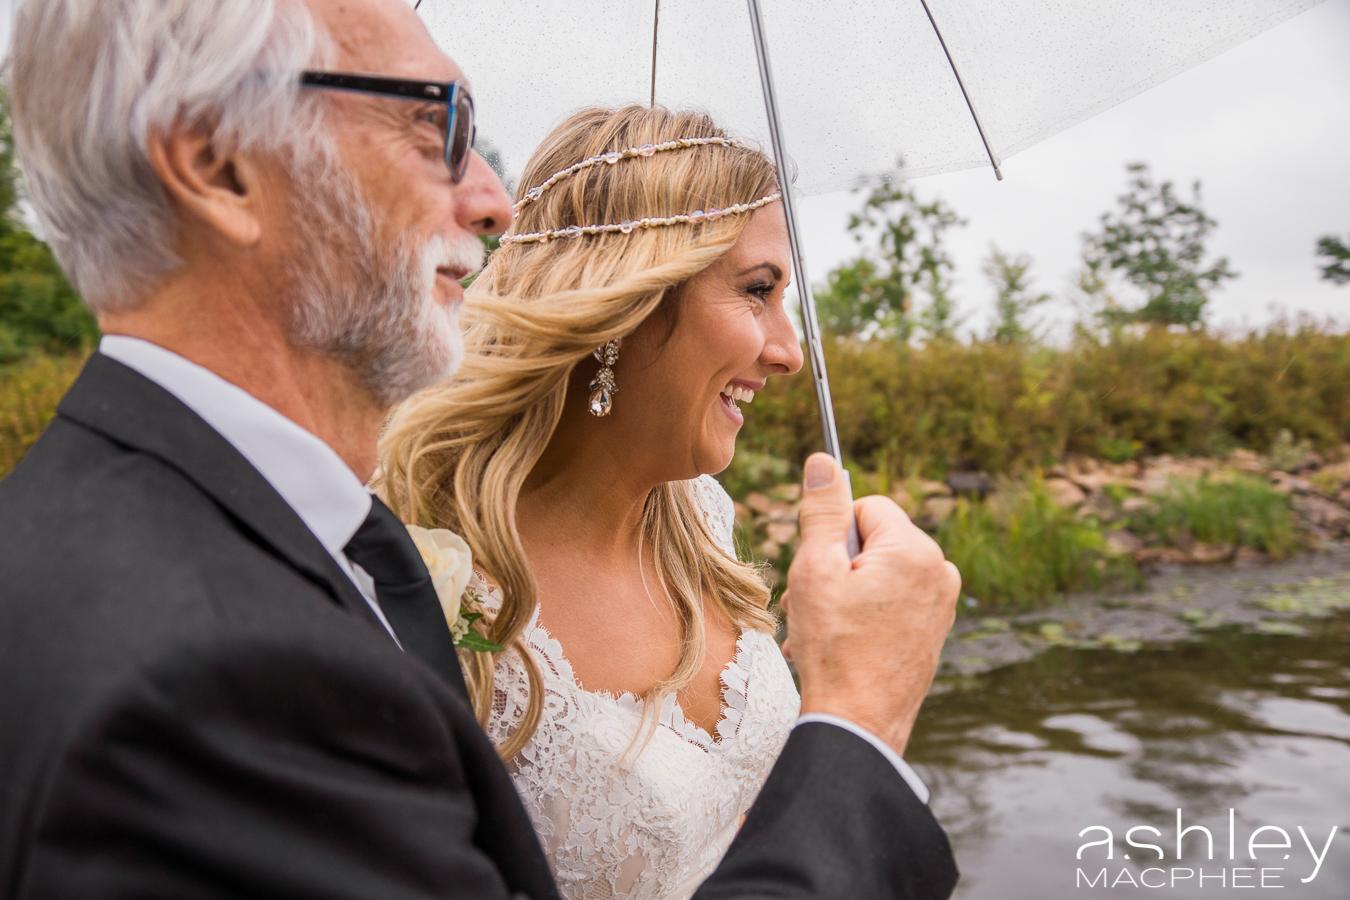 Ashley MacPhee Photography Hudson Yacht Club wedding photographer (29 of 112).jpg